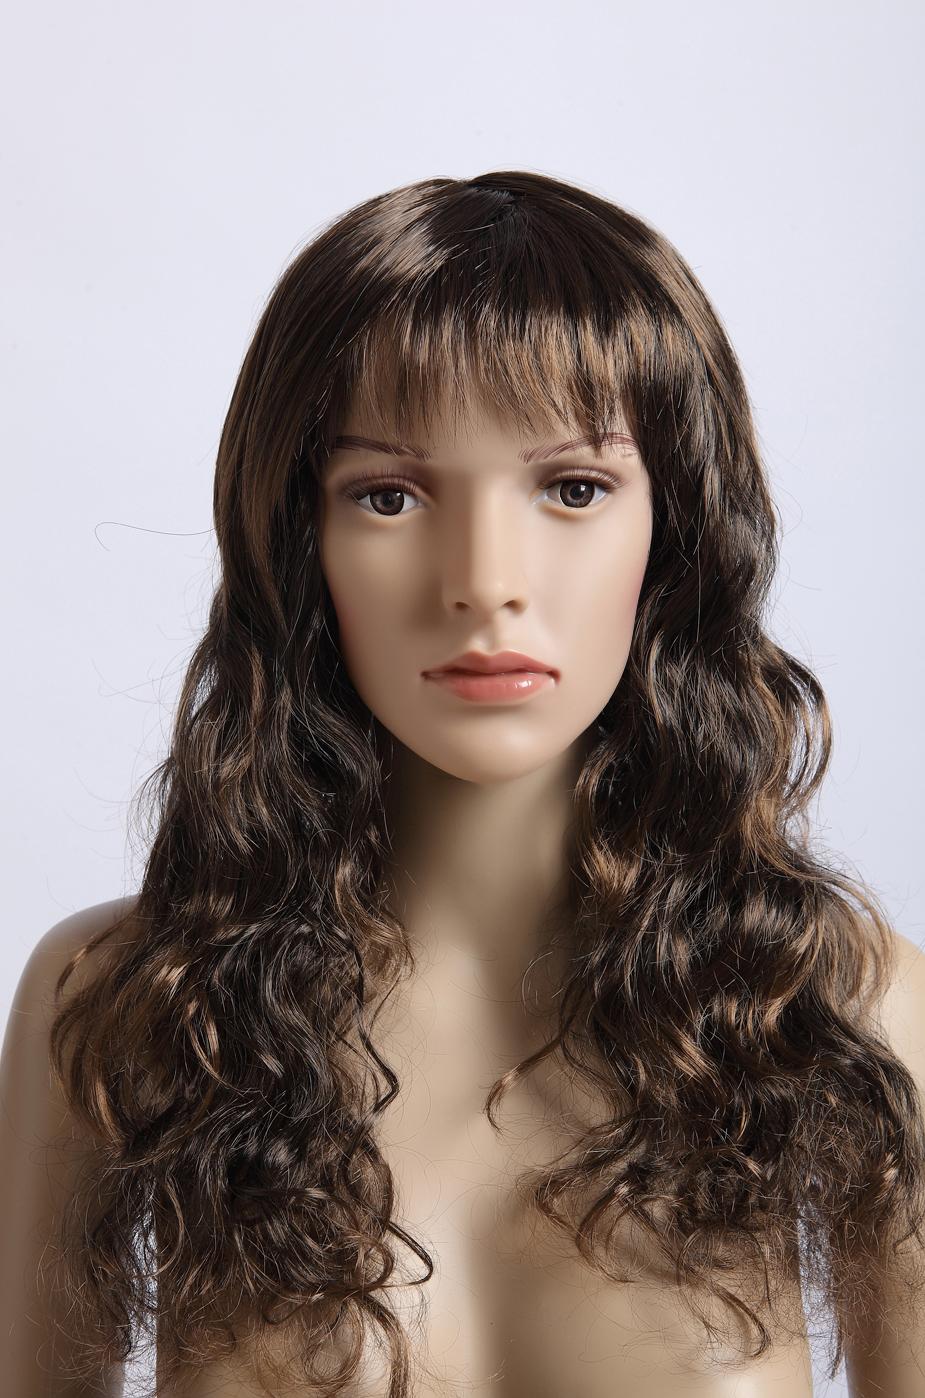 sf 6 mannequin eurotondisplay avec 2 perruques mobile gratuite mannequin ebay. Black Bedroom Furniture Sets. Home Design Ideas